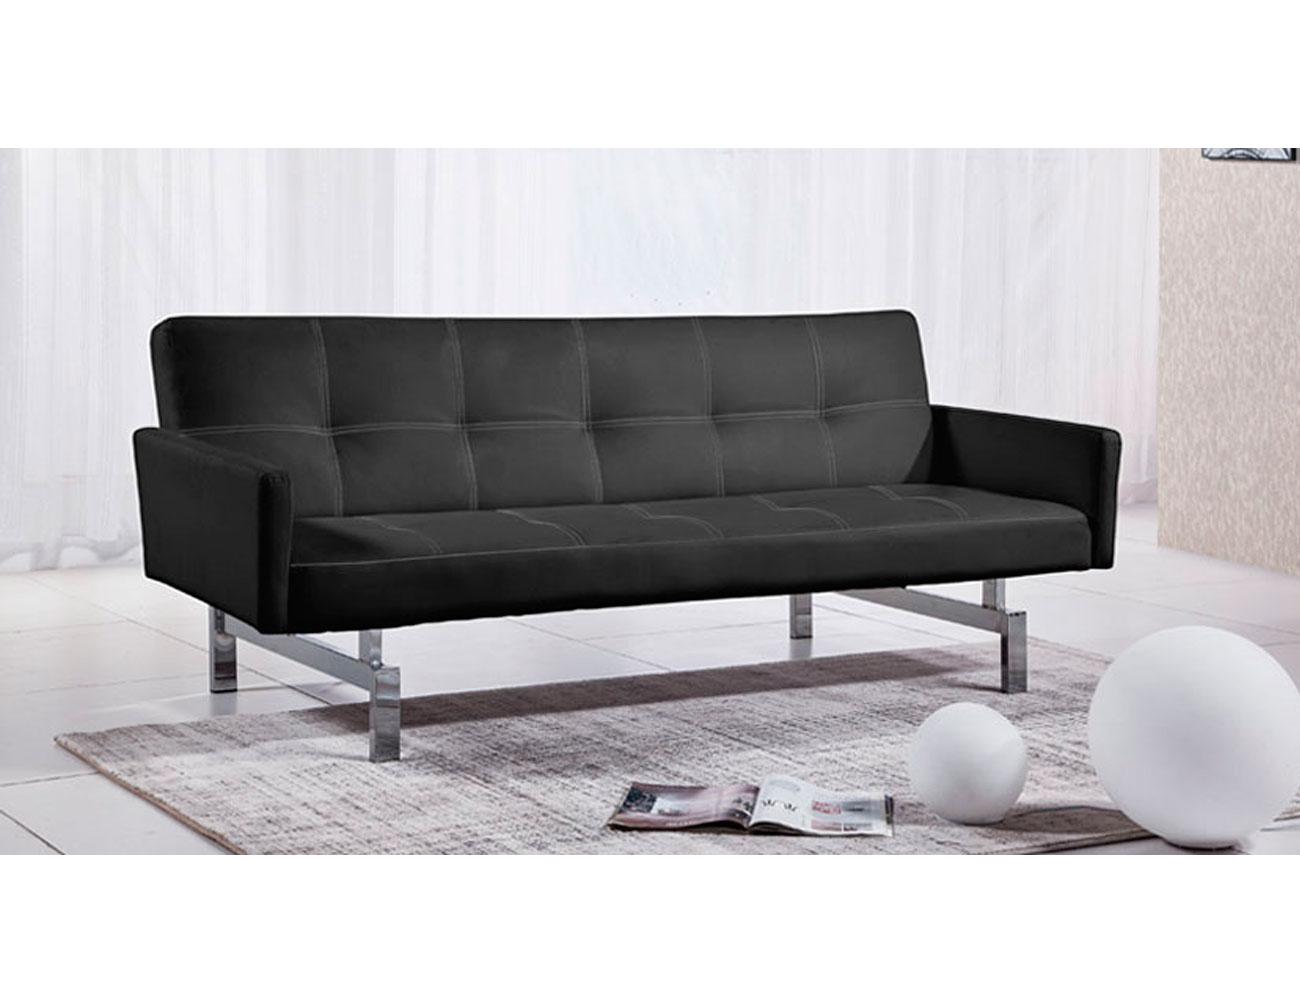 Sofa cama con brazos simil piel negro